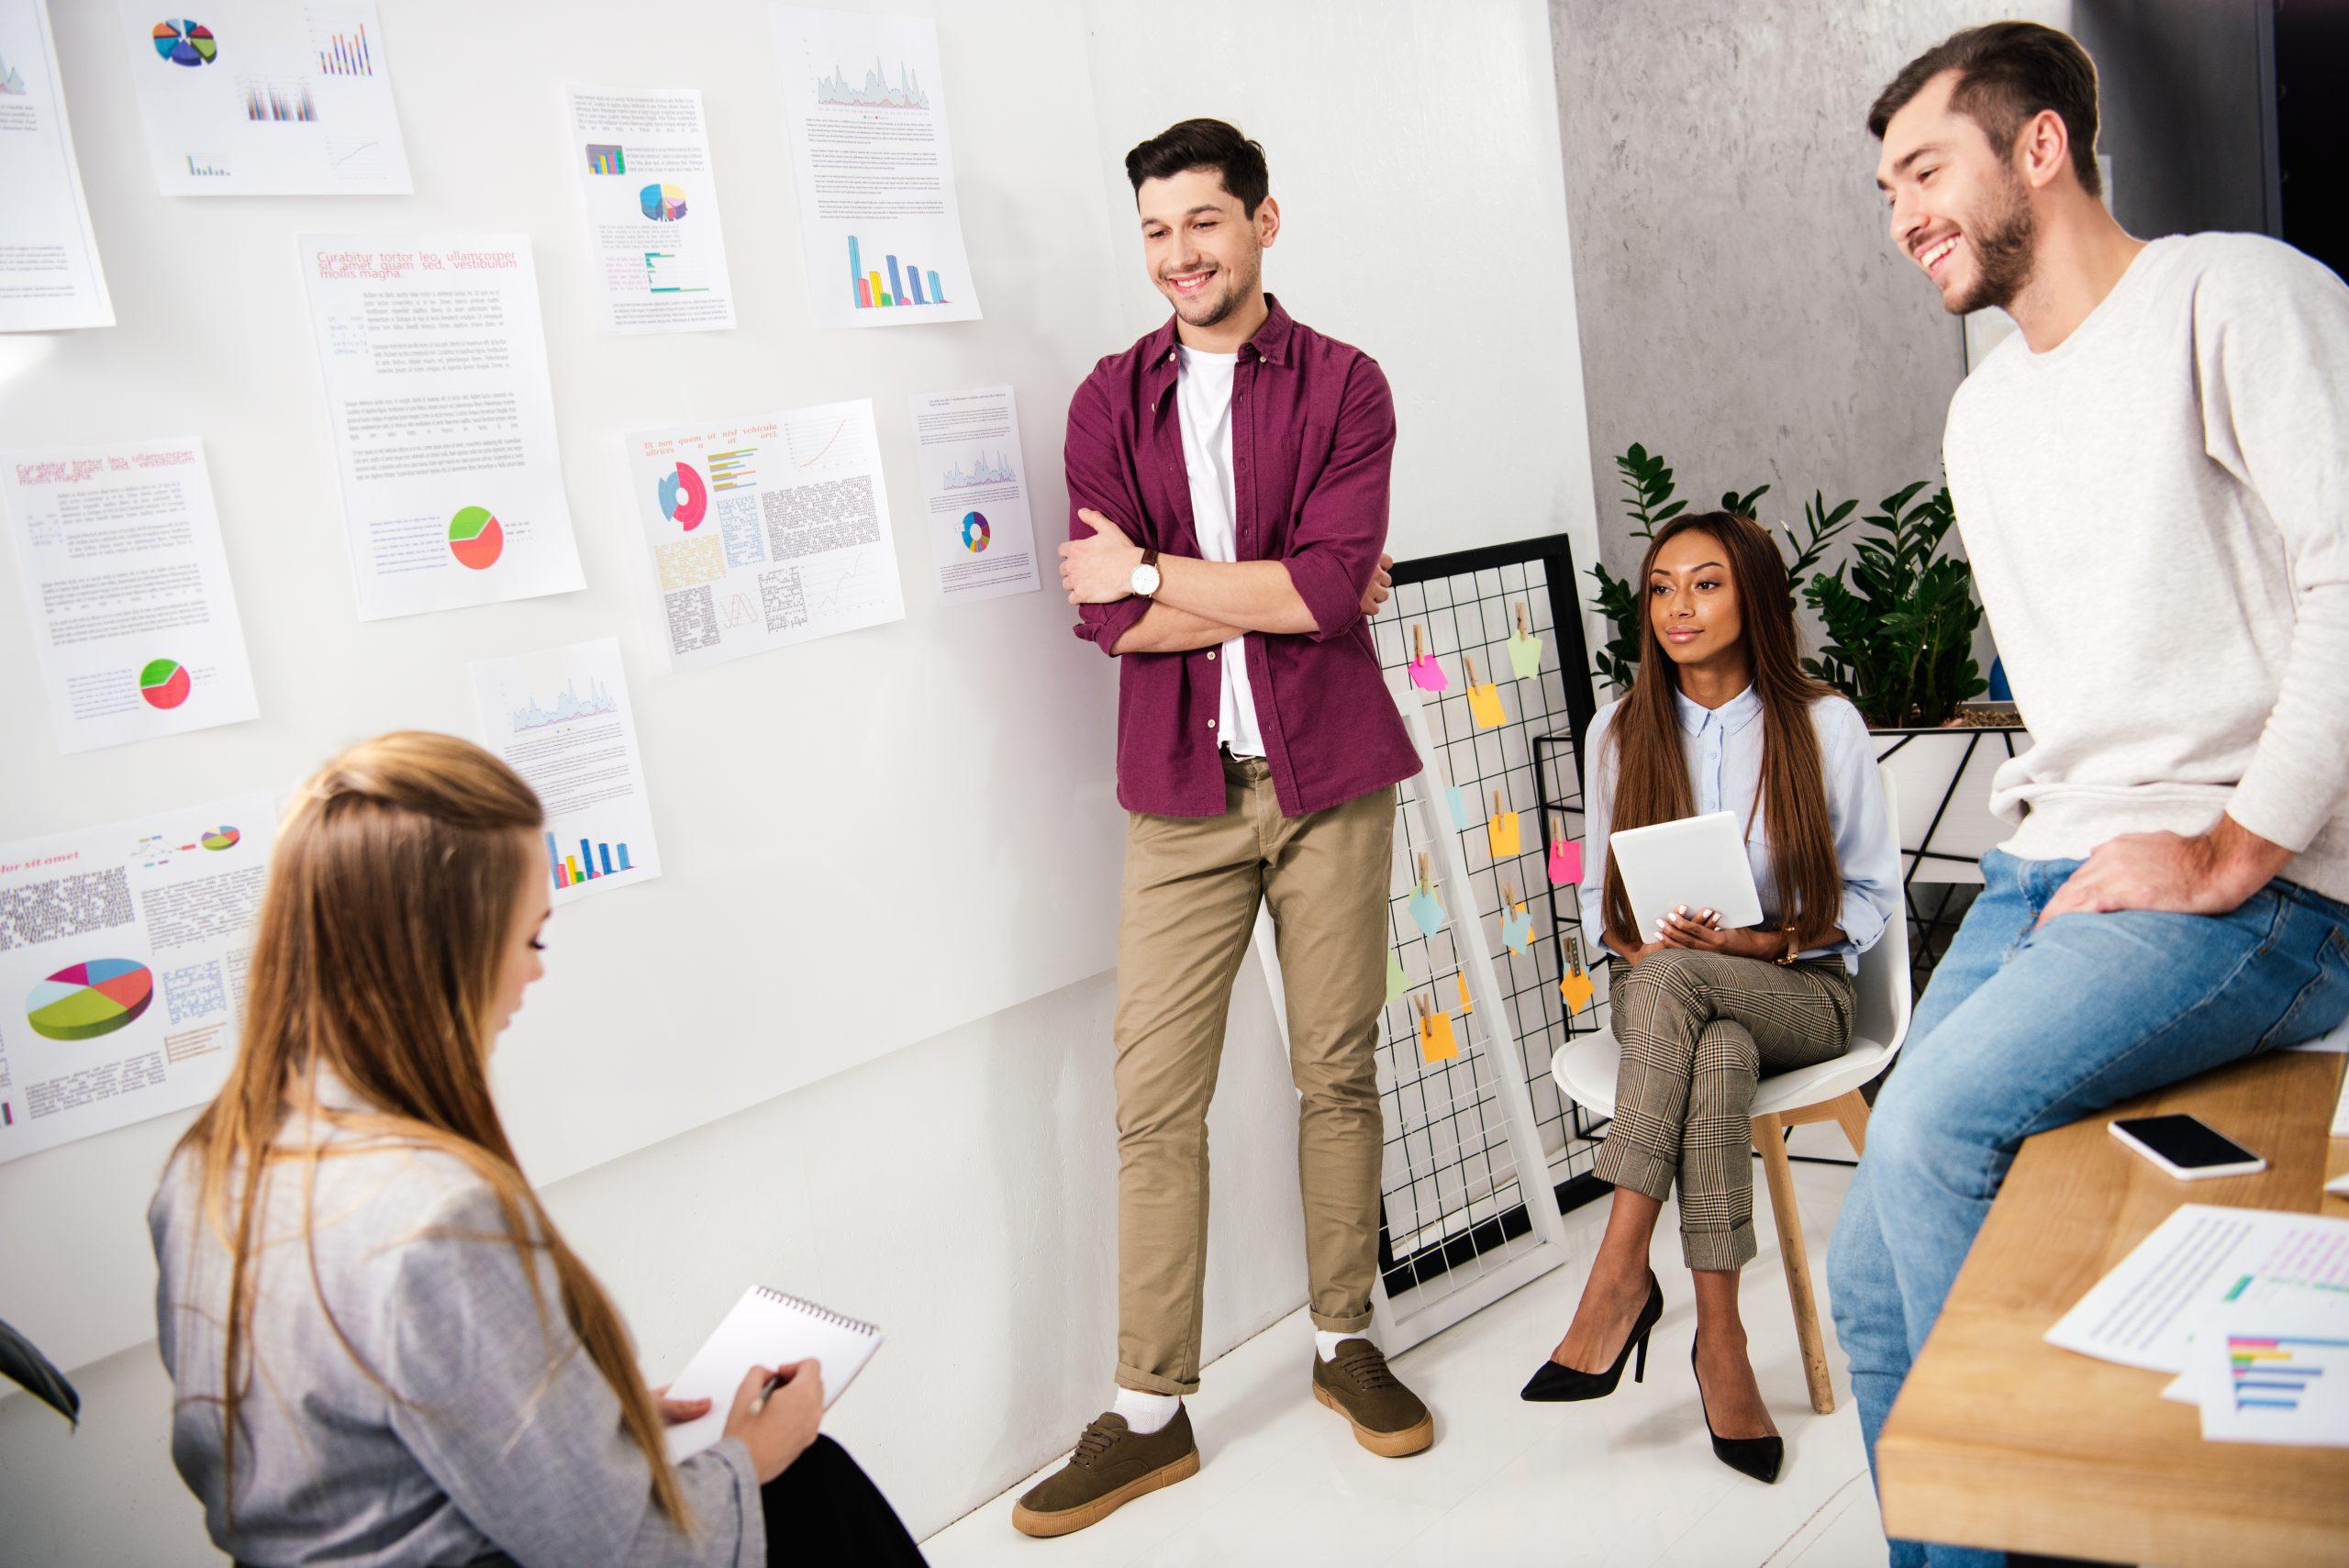 188122920_xl-diverse-staff-marketing